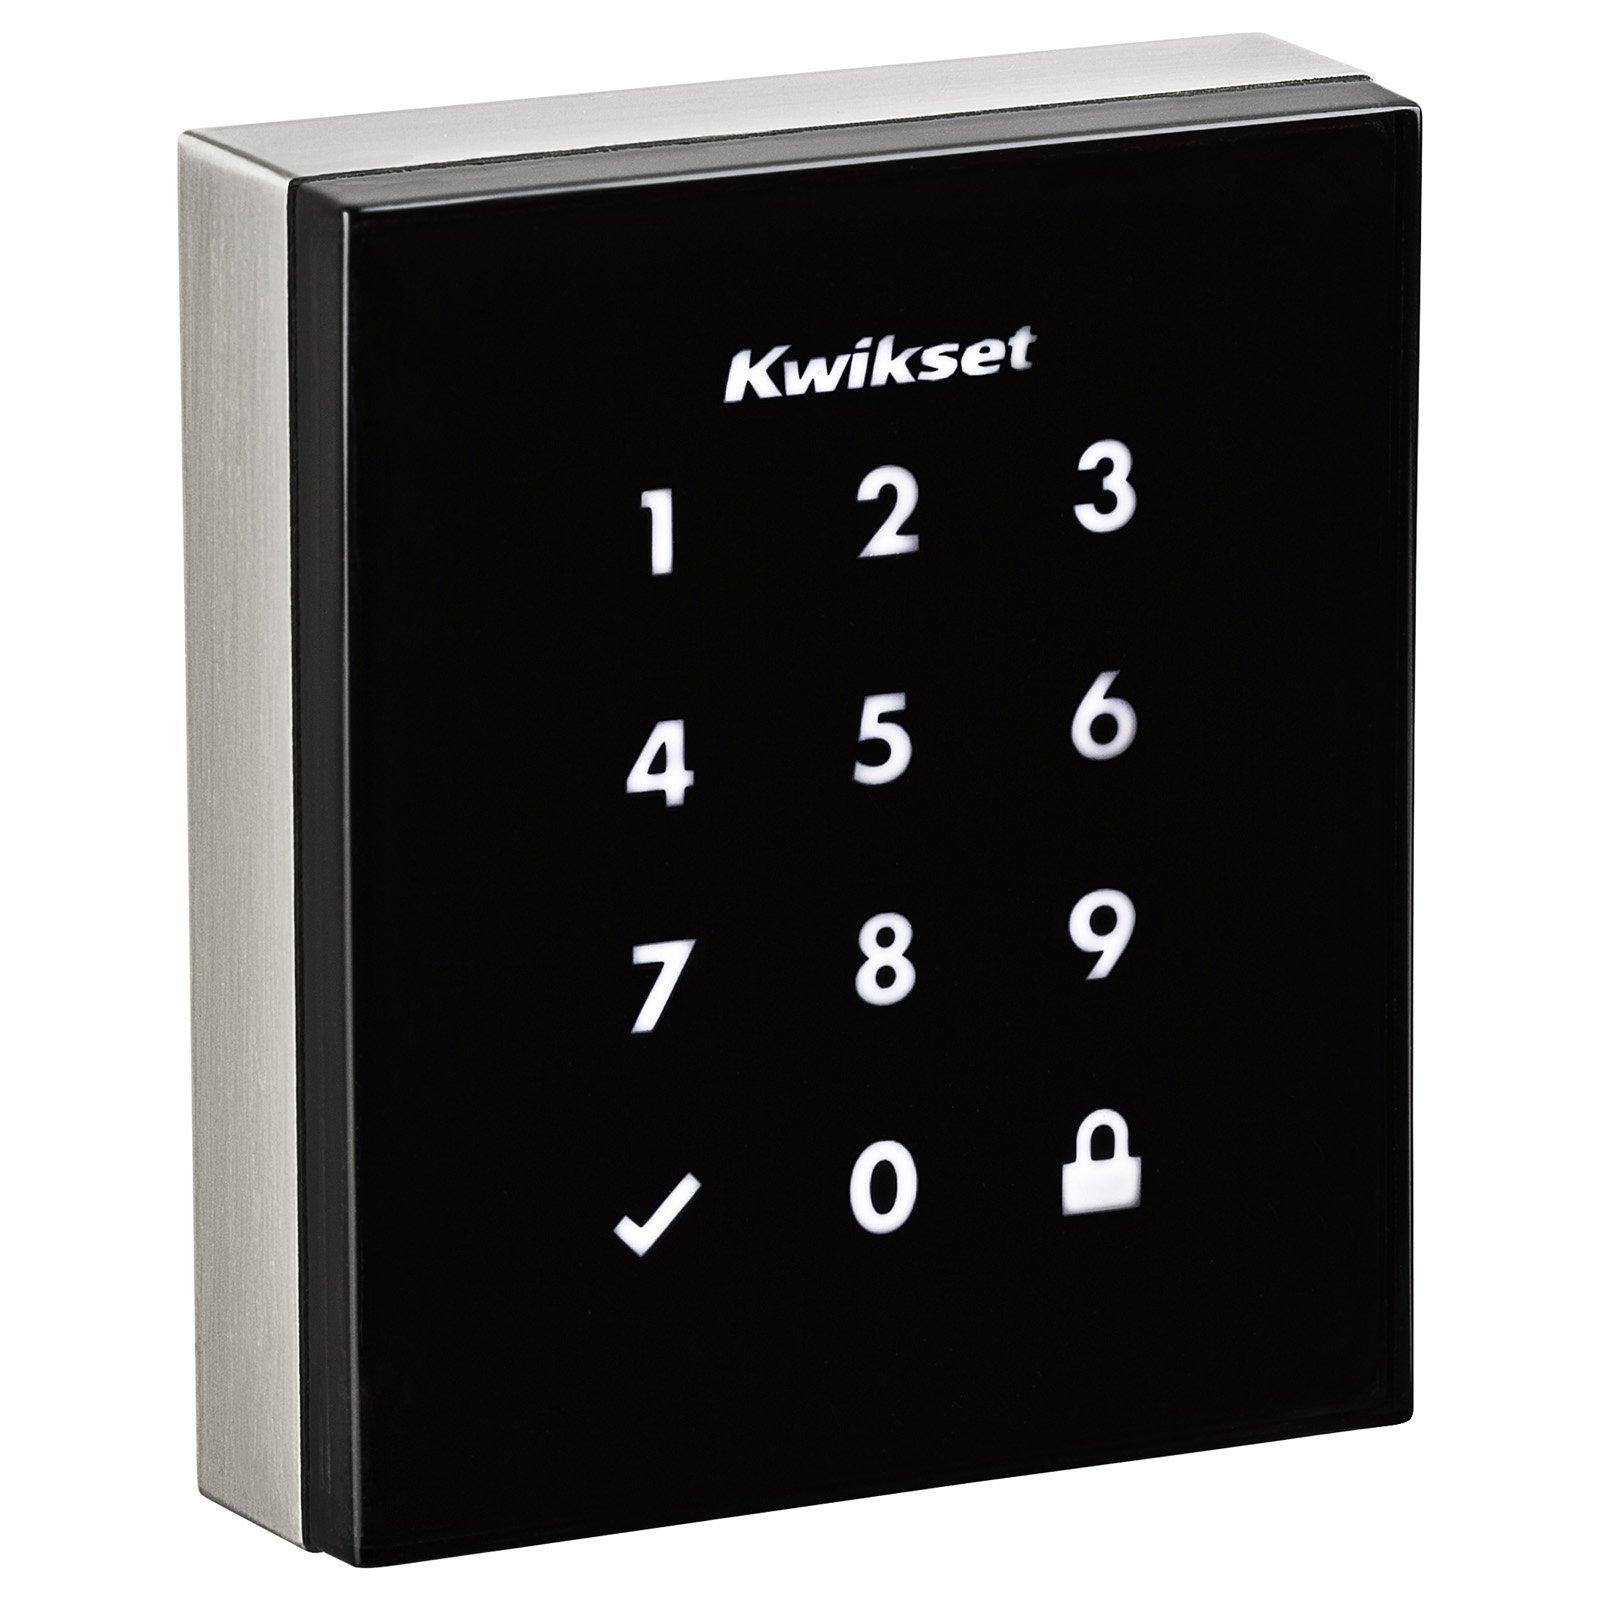 Kwikset 99530-001 Obsidian Slim Modern Electronic Touchscreen Keyless Deadbolt Satin Nickel